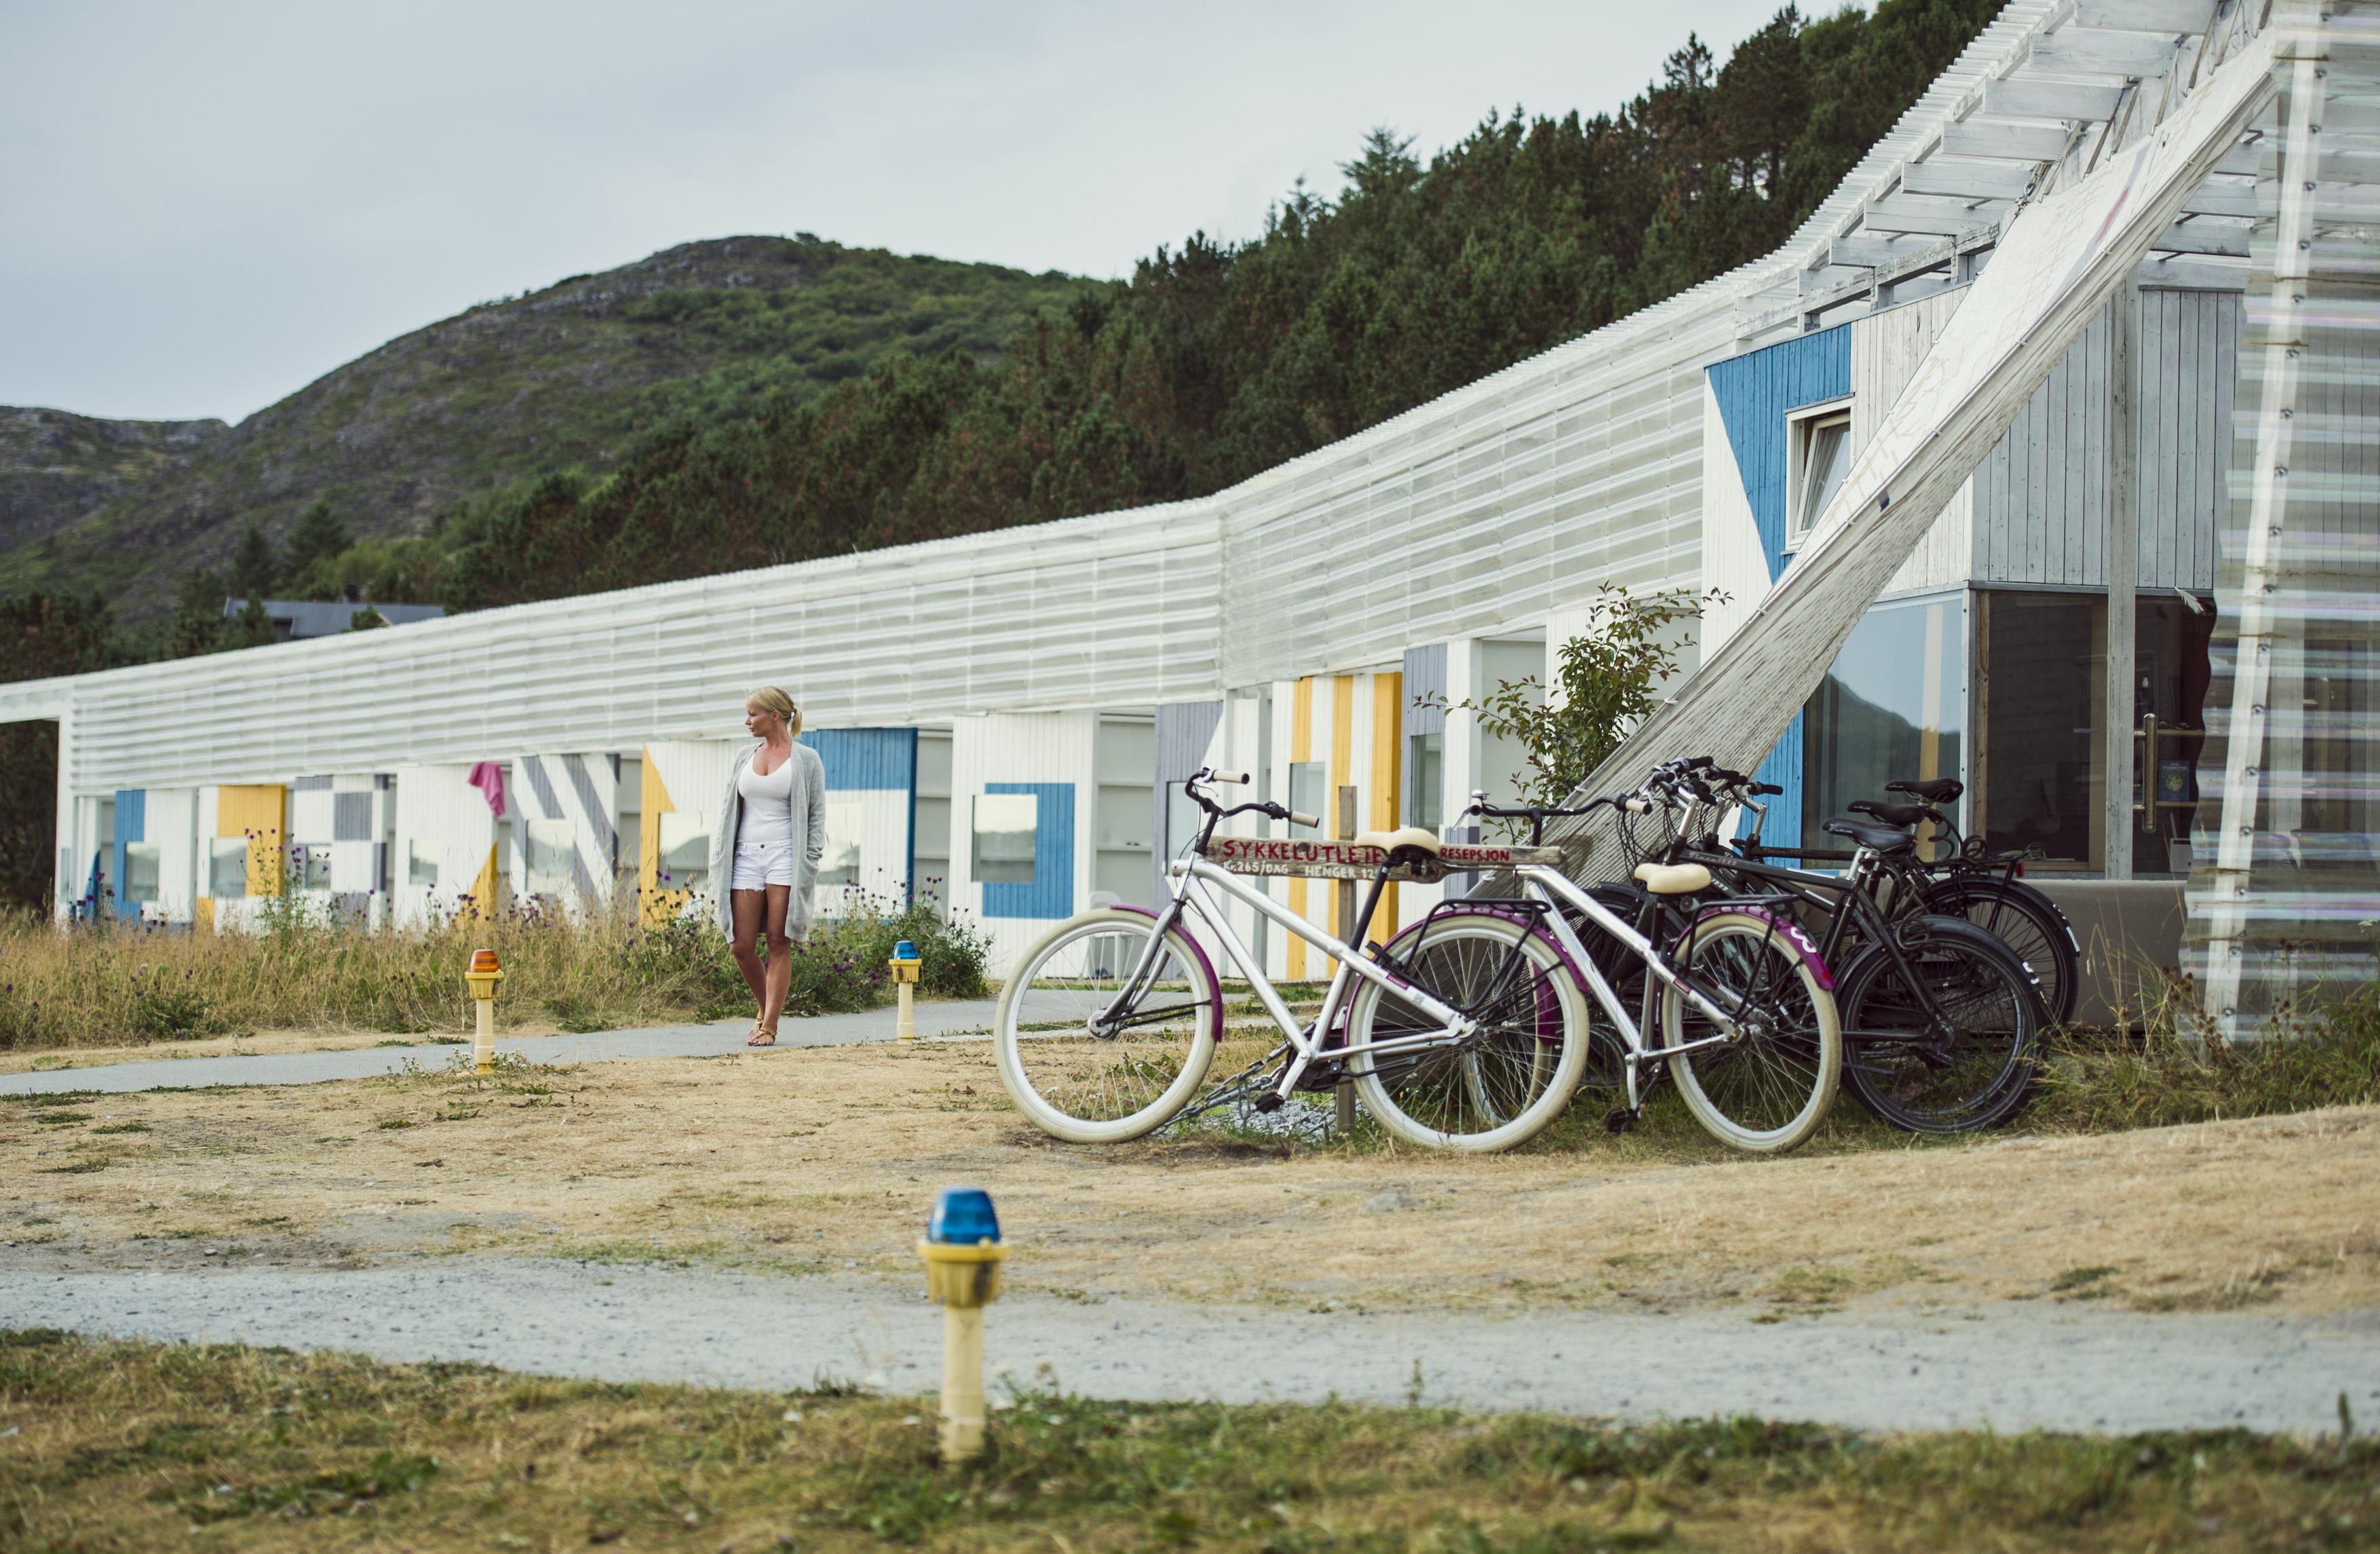 Sub-lugar på Stokkøya Sjøsenter i Åfjord. Foto: CH / trondelag.com